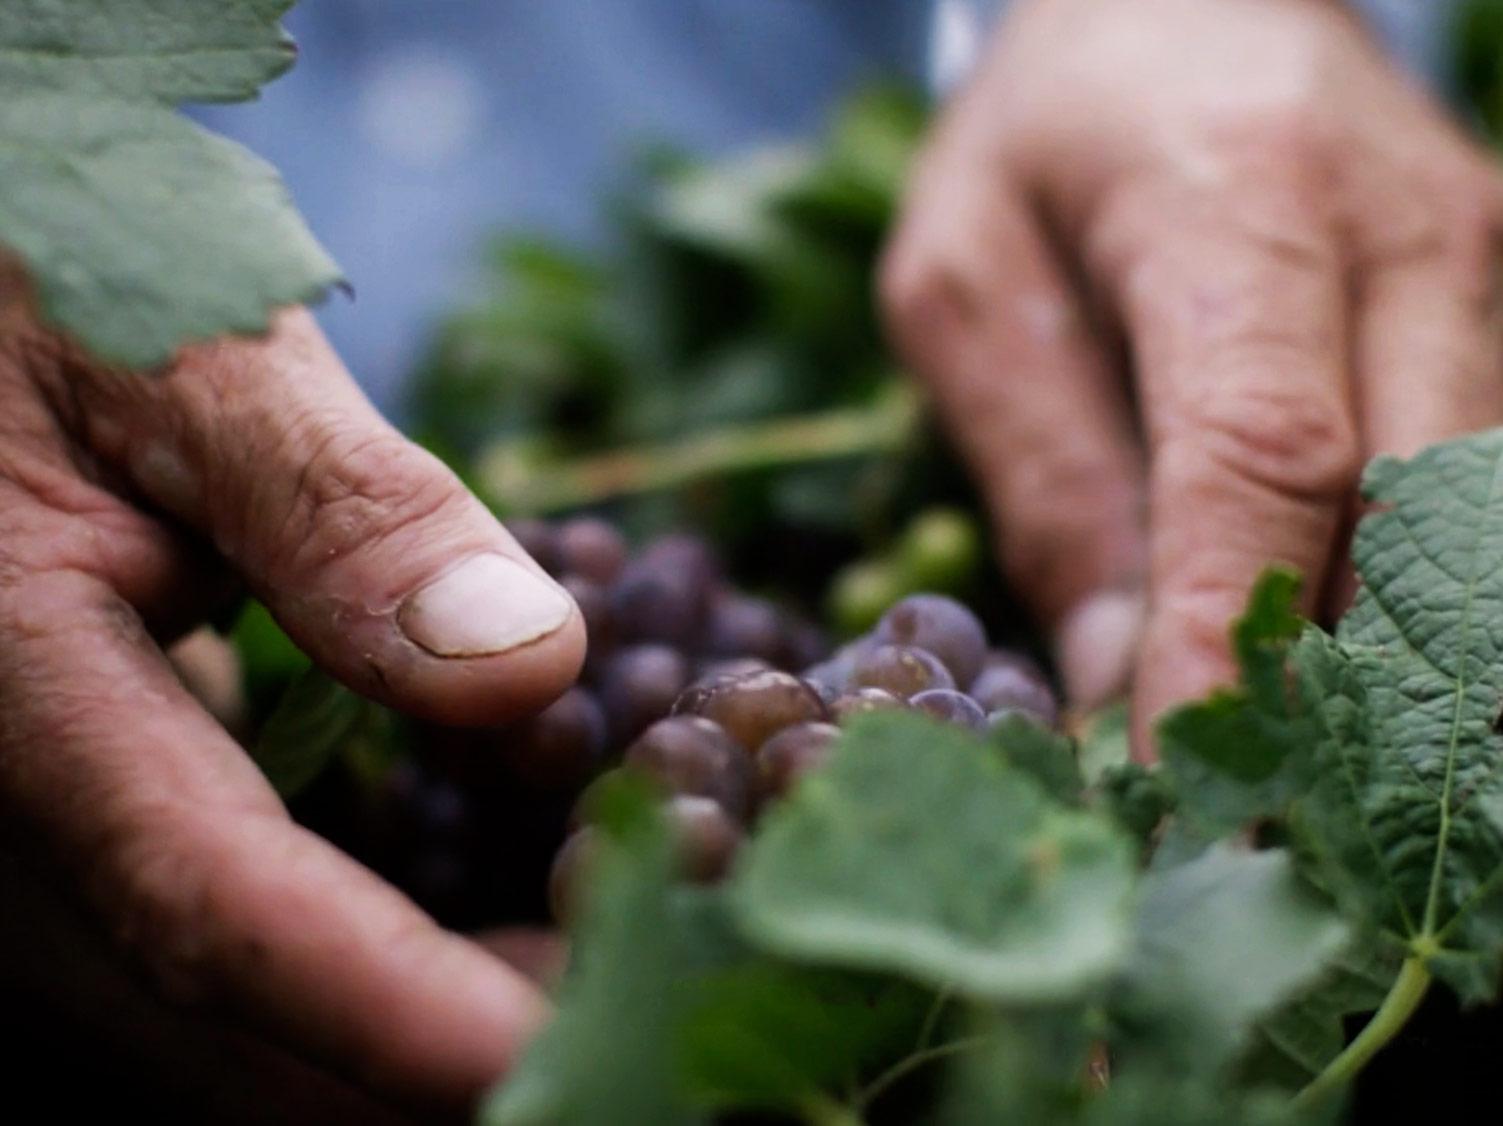 Manos recogiendo uvas